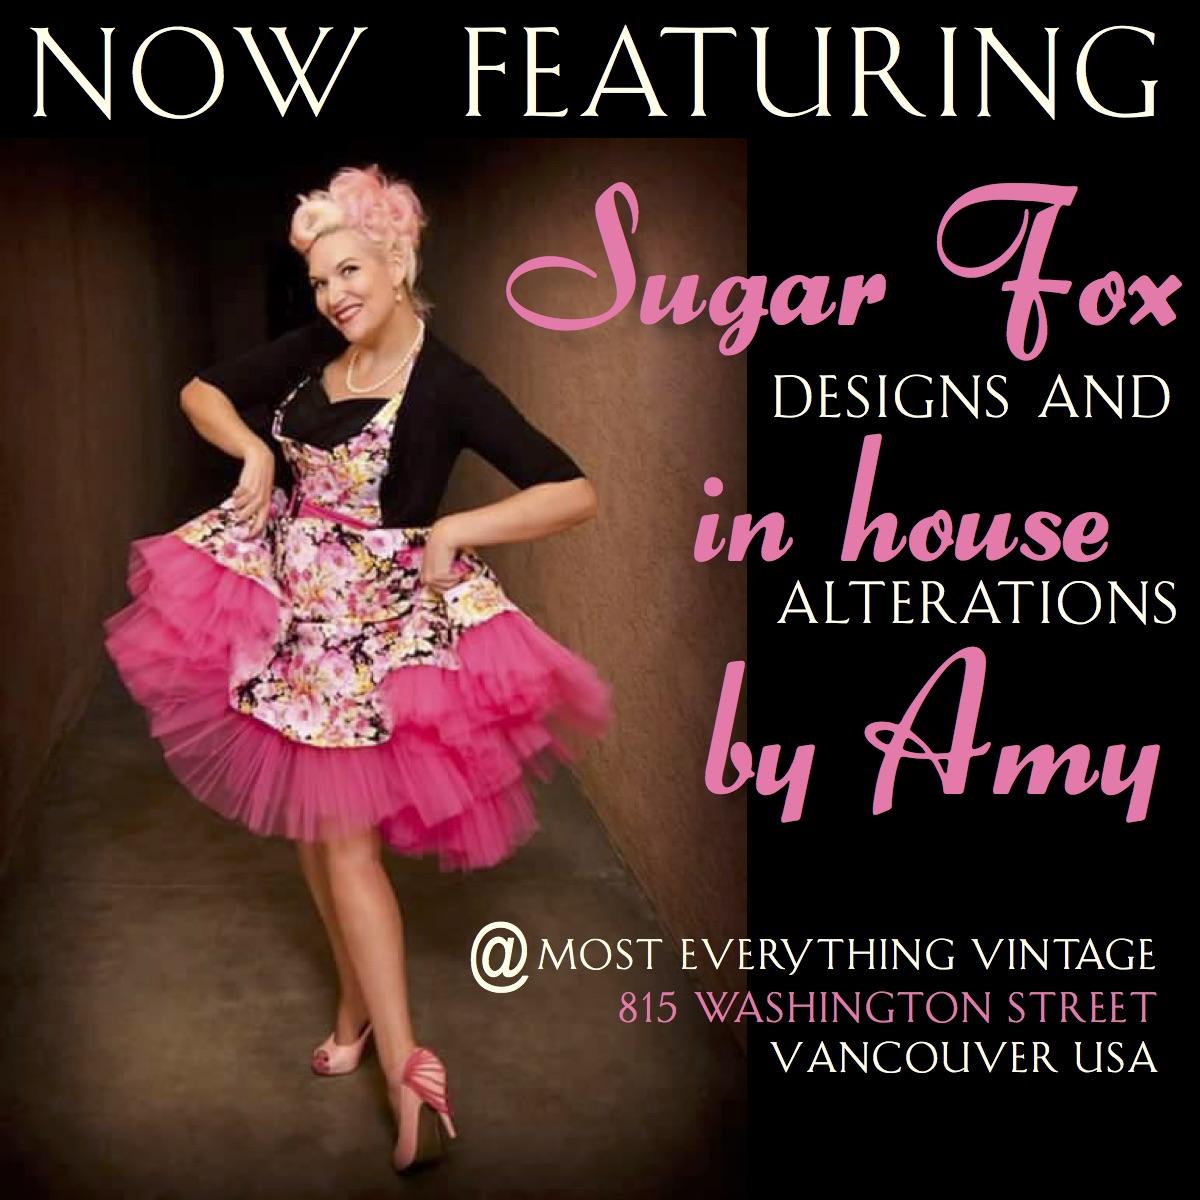 Sugar Fox promo